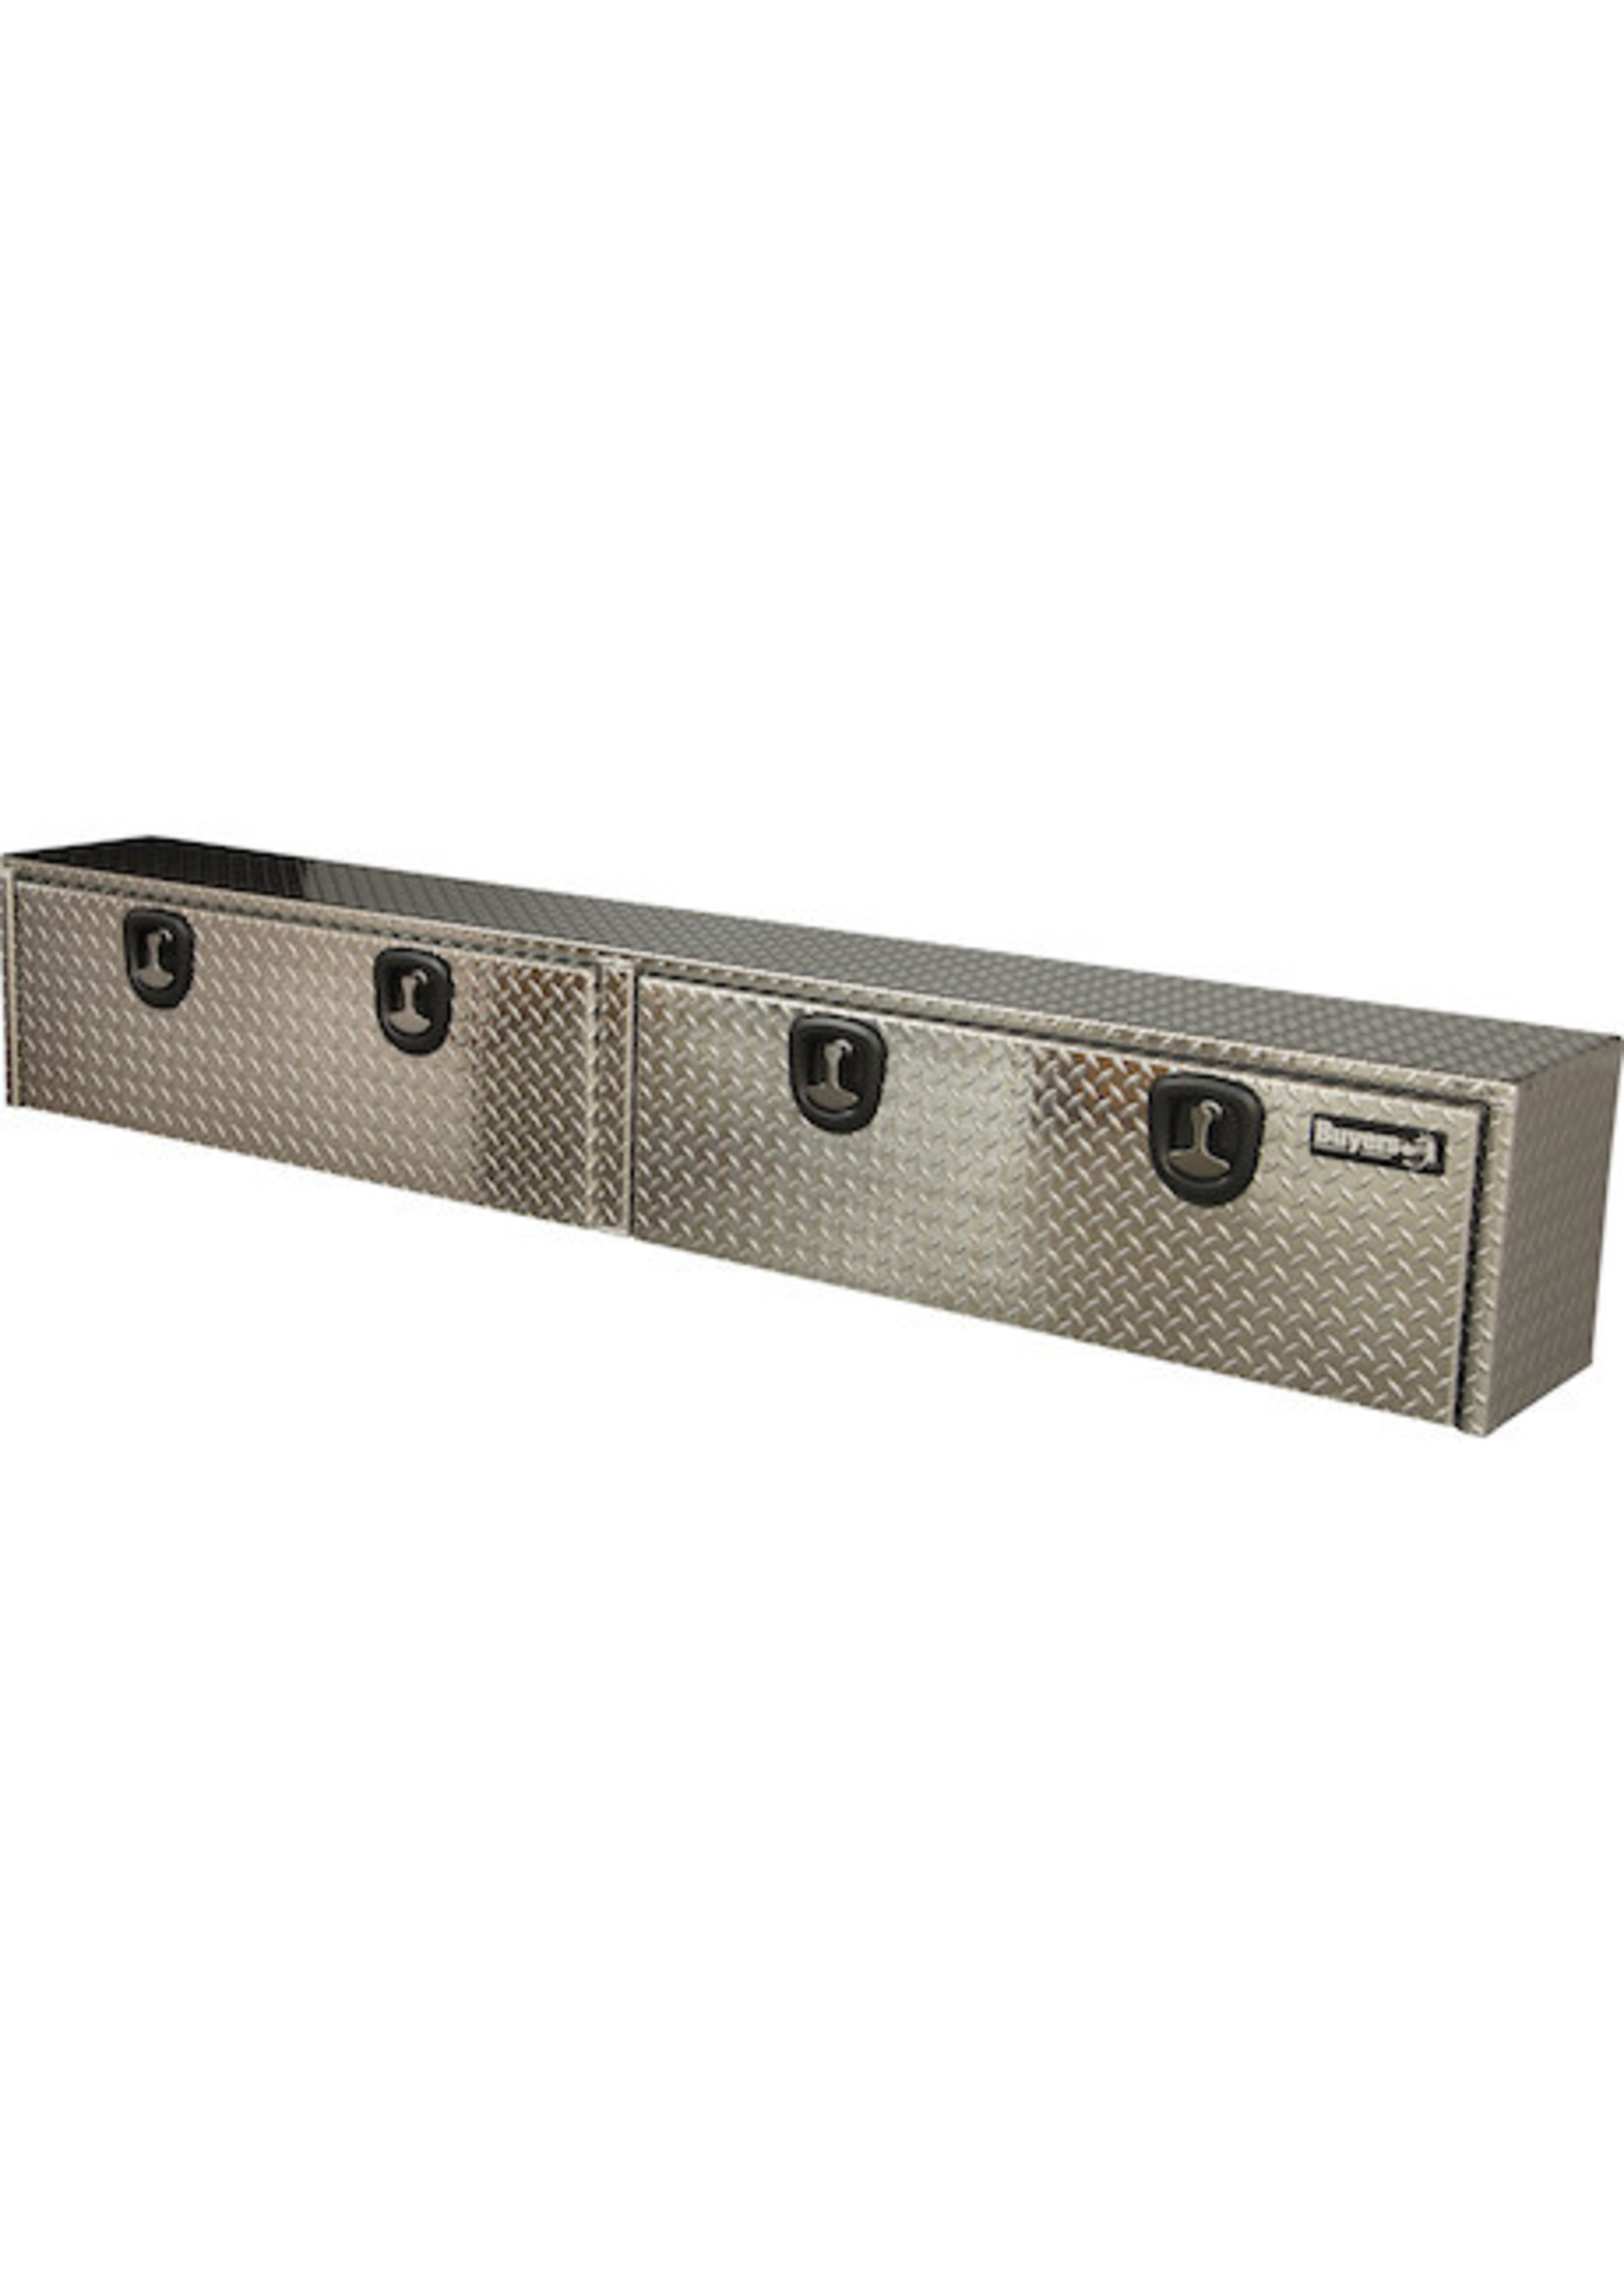 Buyers Products Company Diamond Tread Aluminum Topsider Truck Box Series